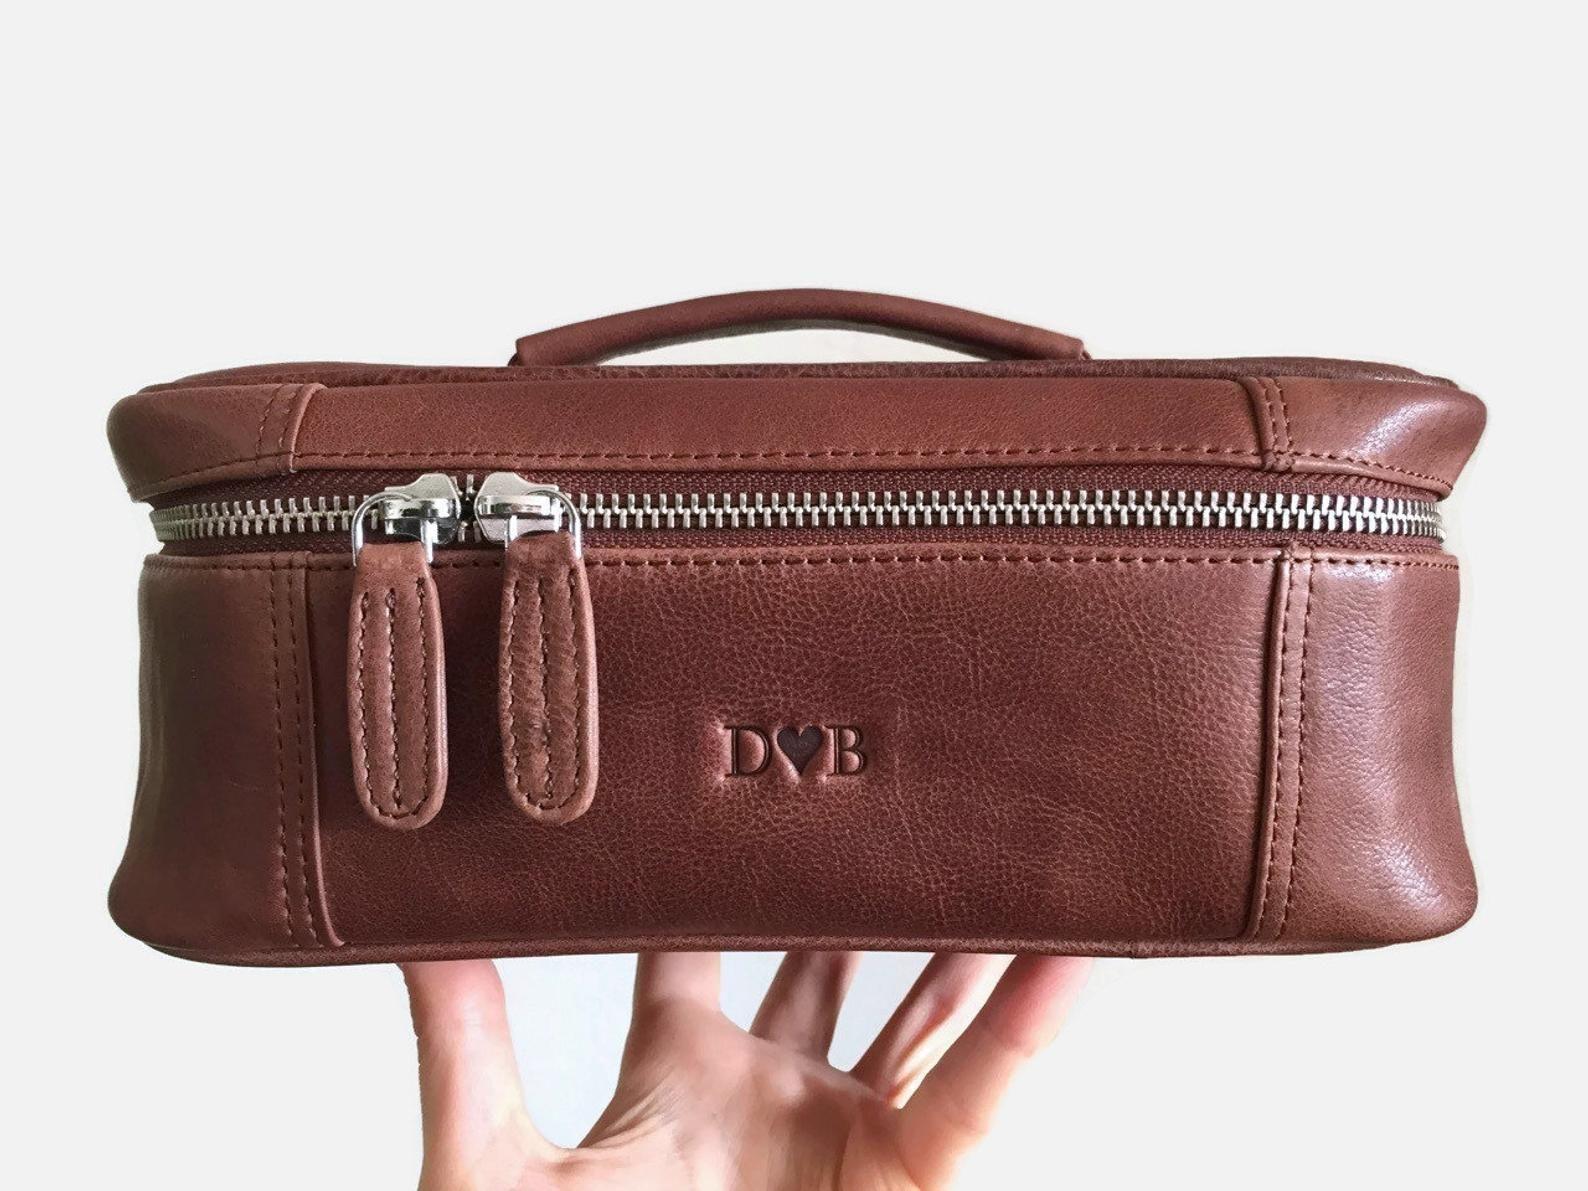 Monogrammed large toiletry bag Makeup bag leather